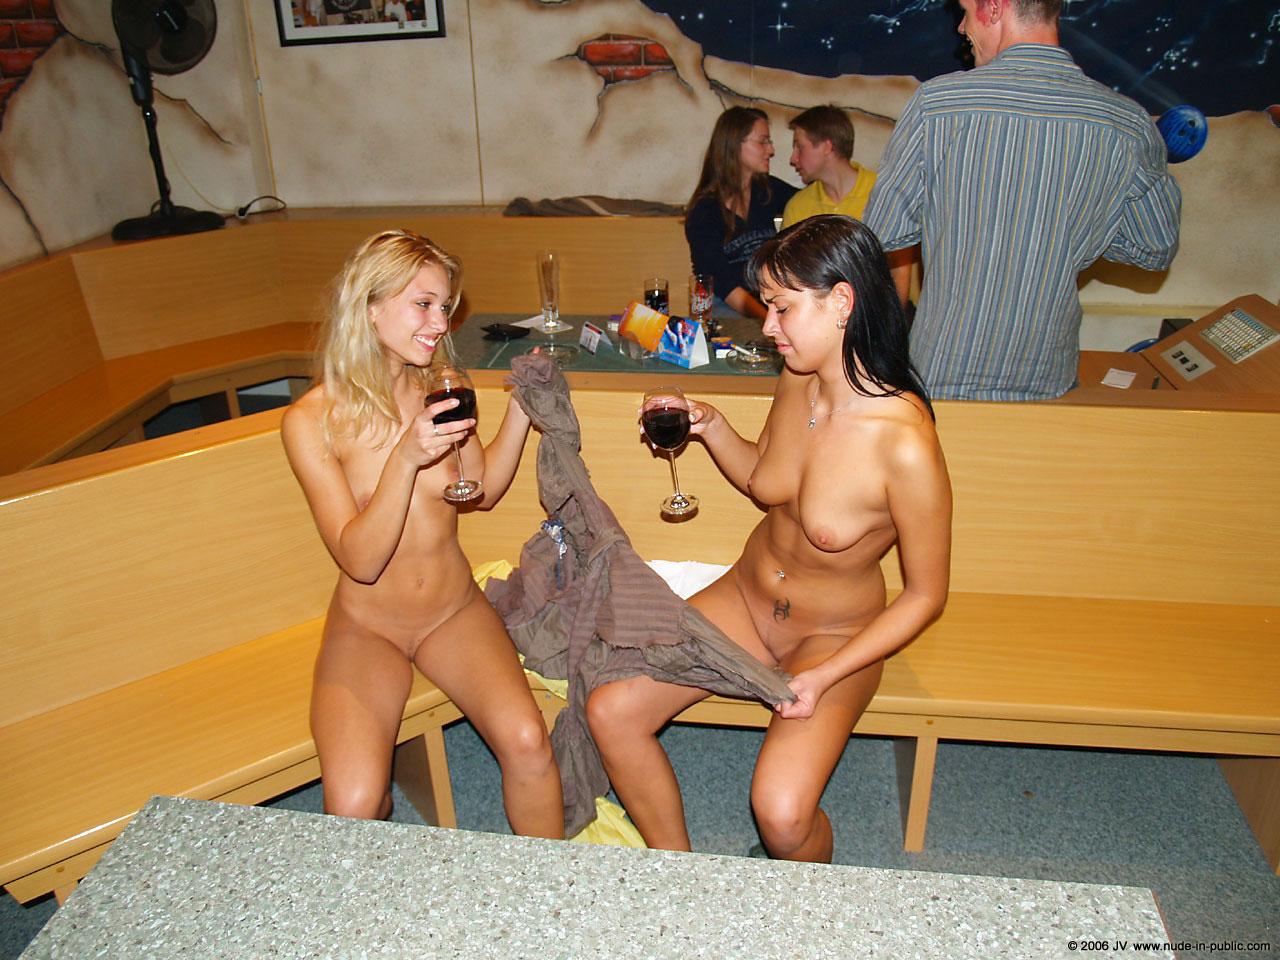 Стриптиз на публике с аналом порно 11 фотография